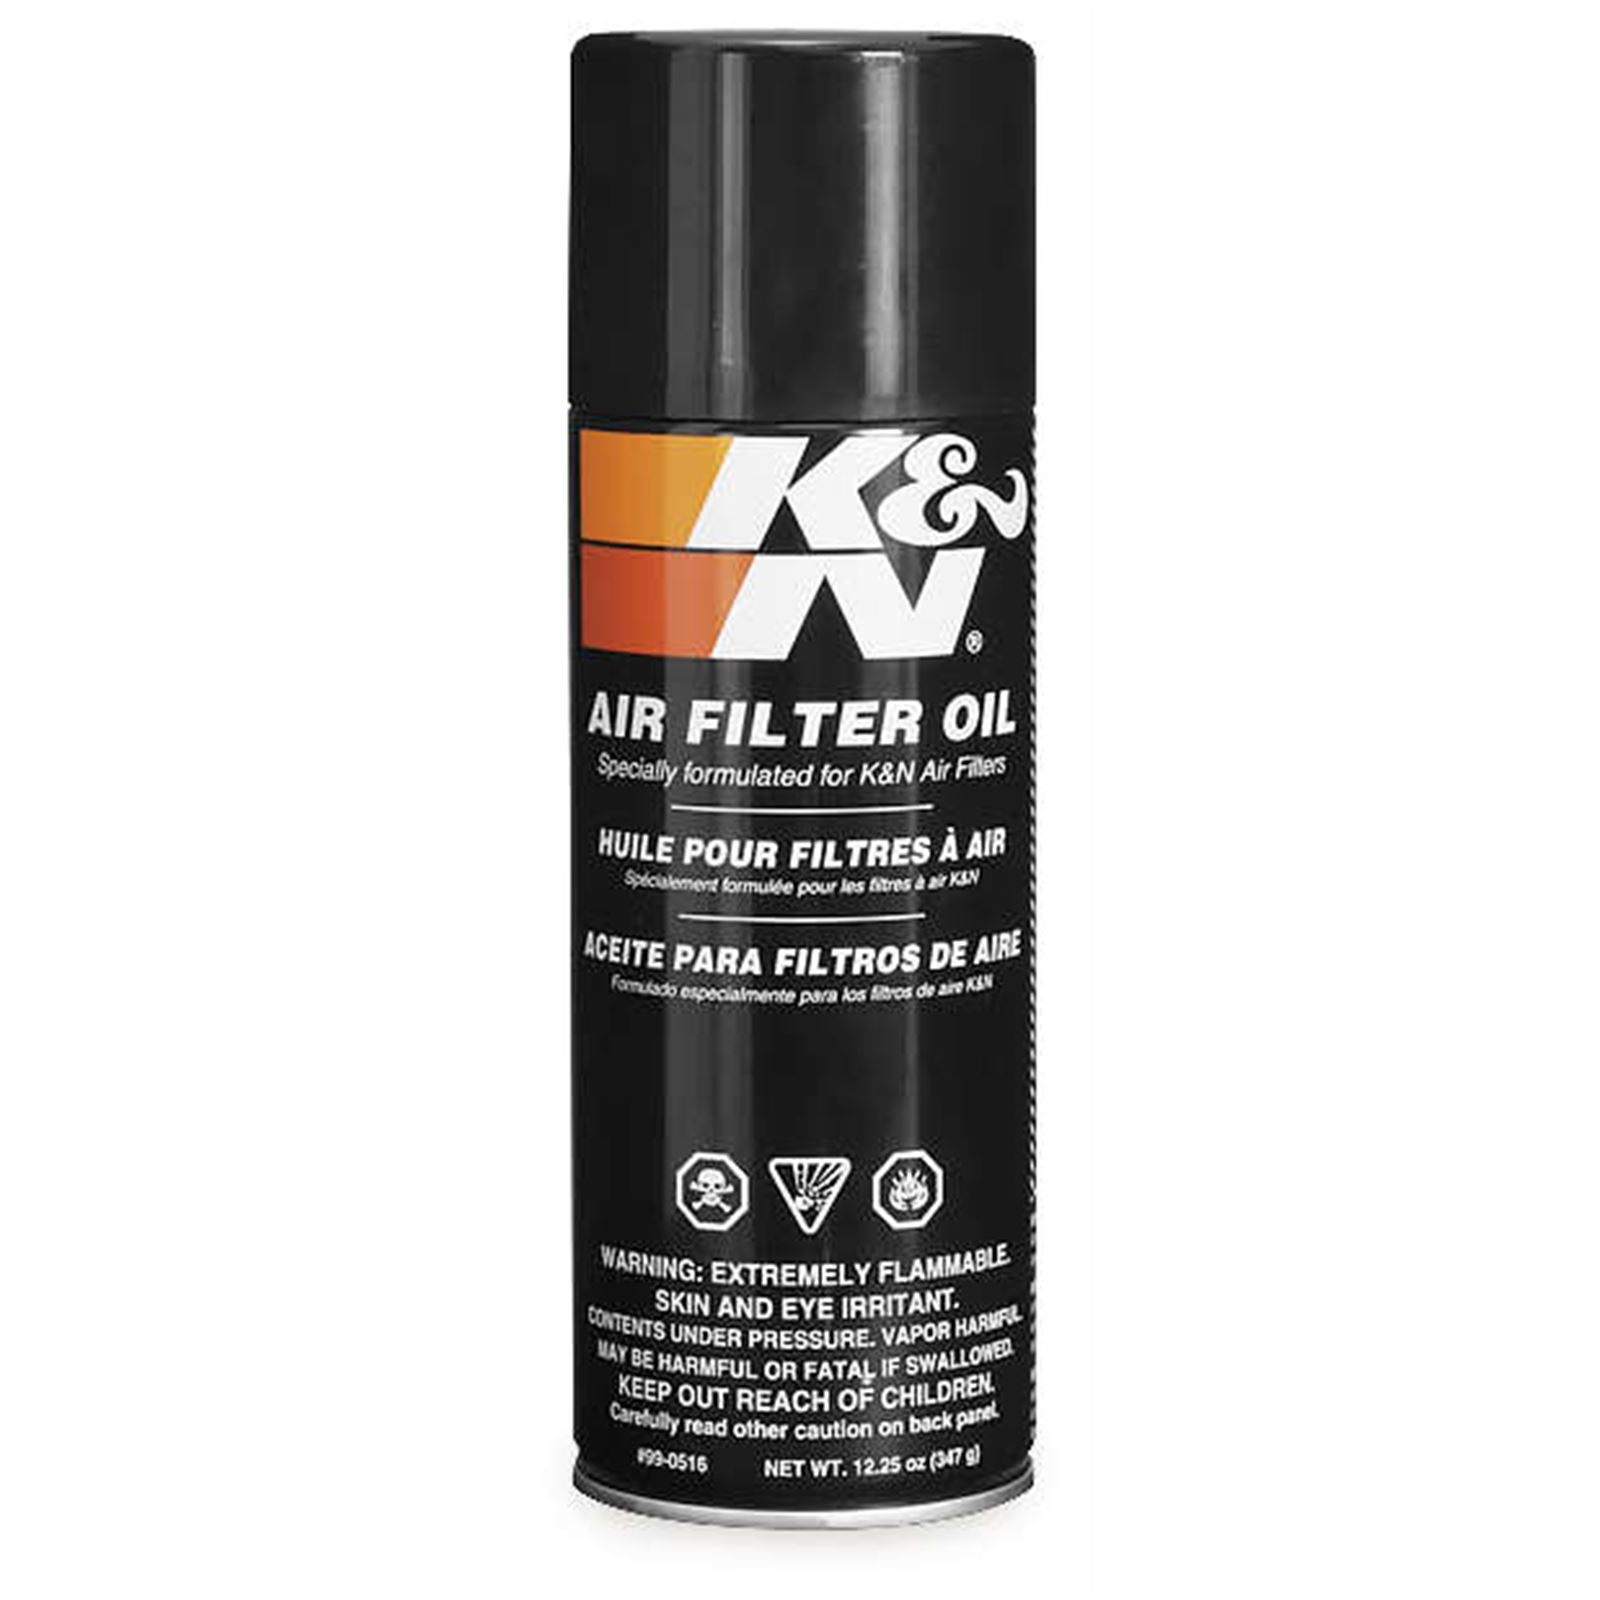 K N Air Filter Oil